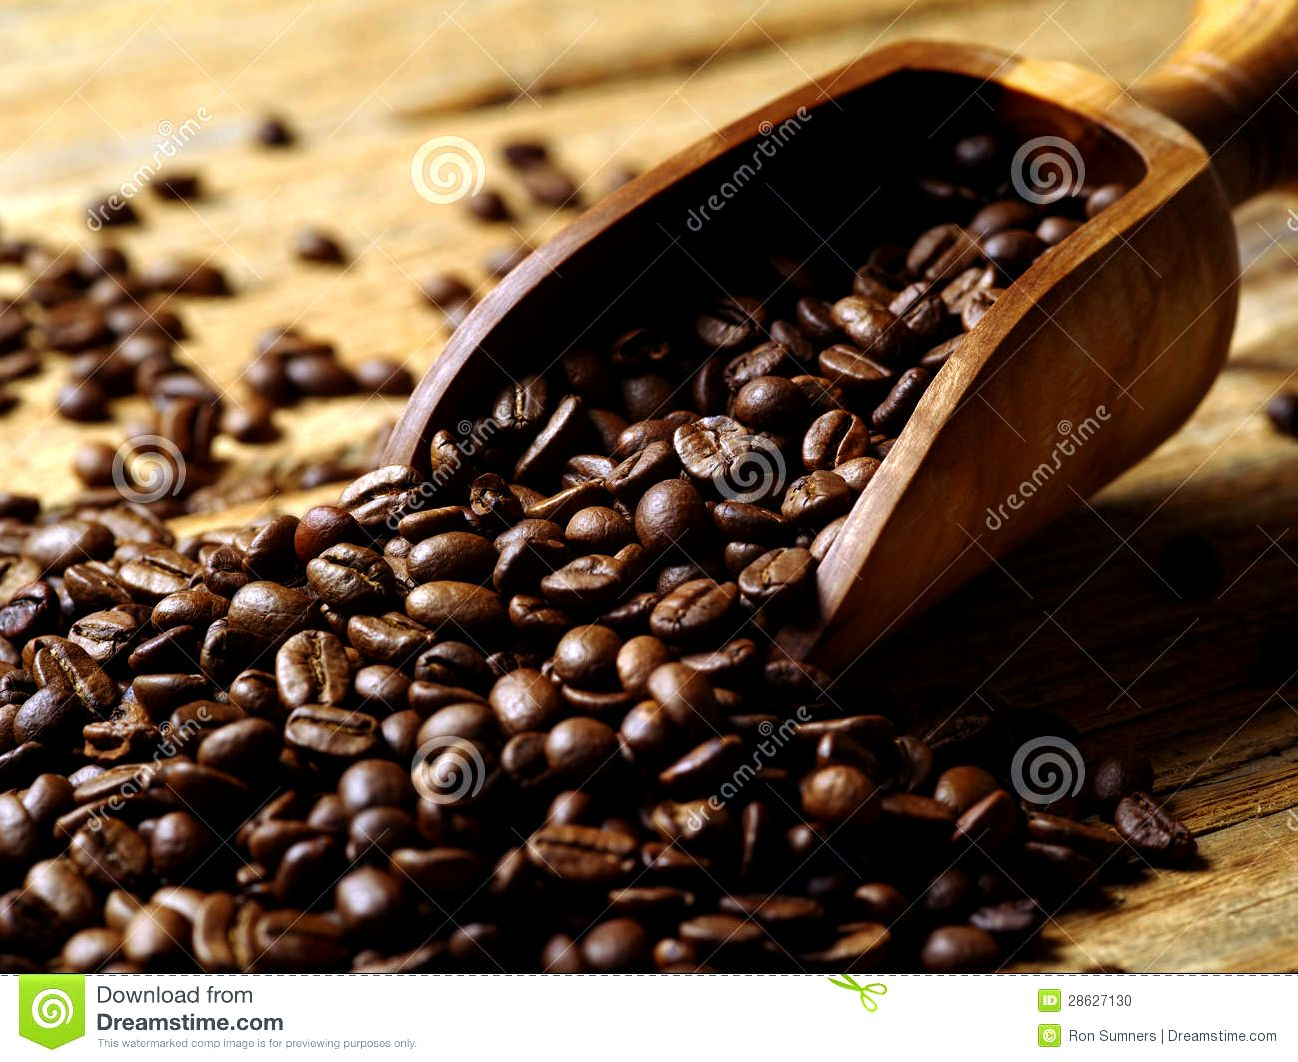 Resting fresh-roasted coffee - len's coffee maybe twenty minutes